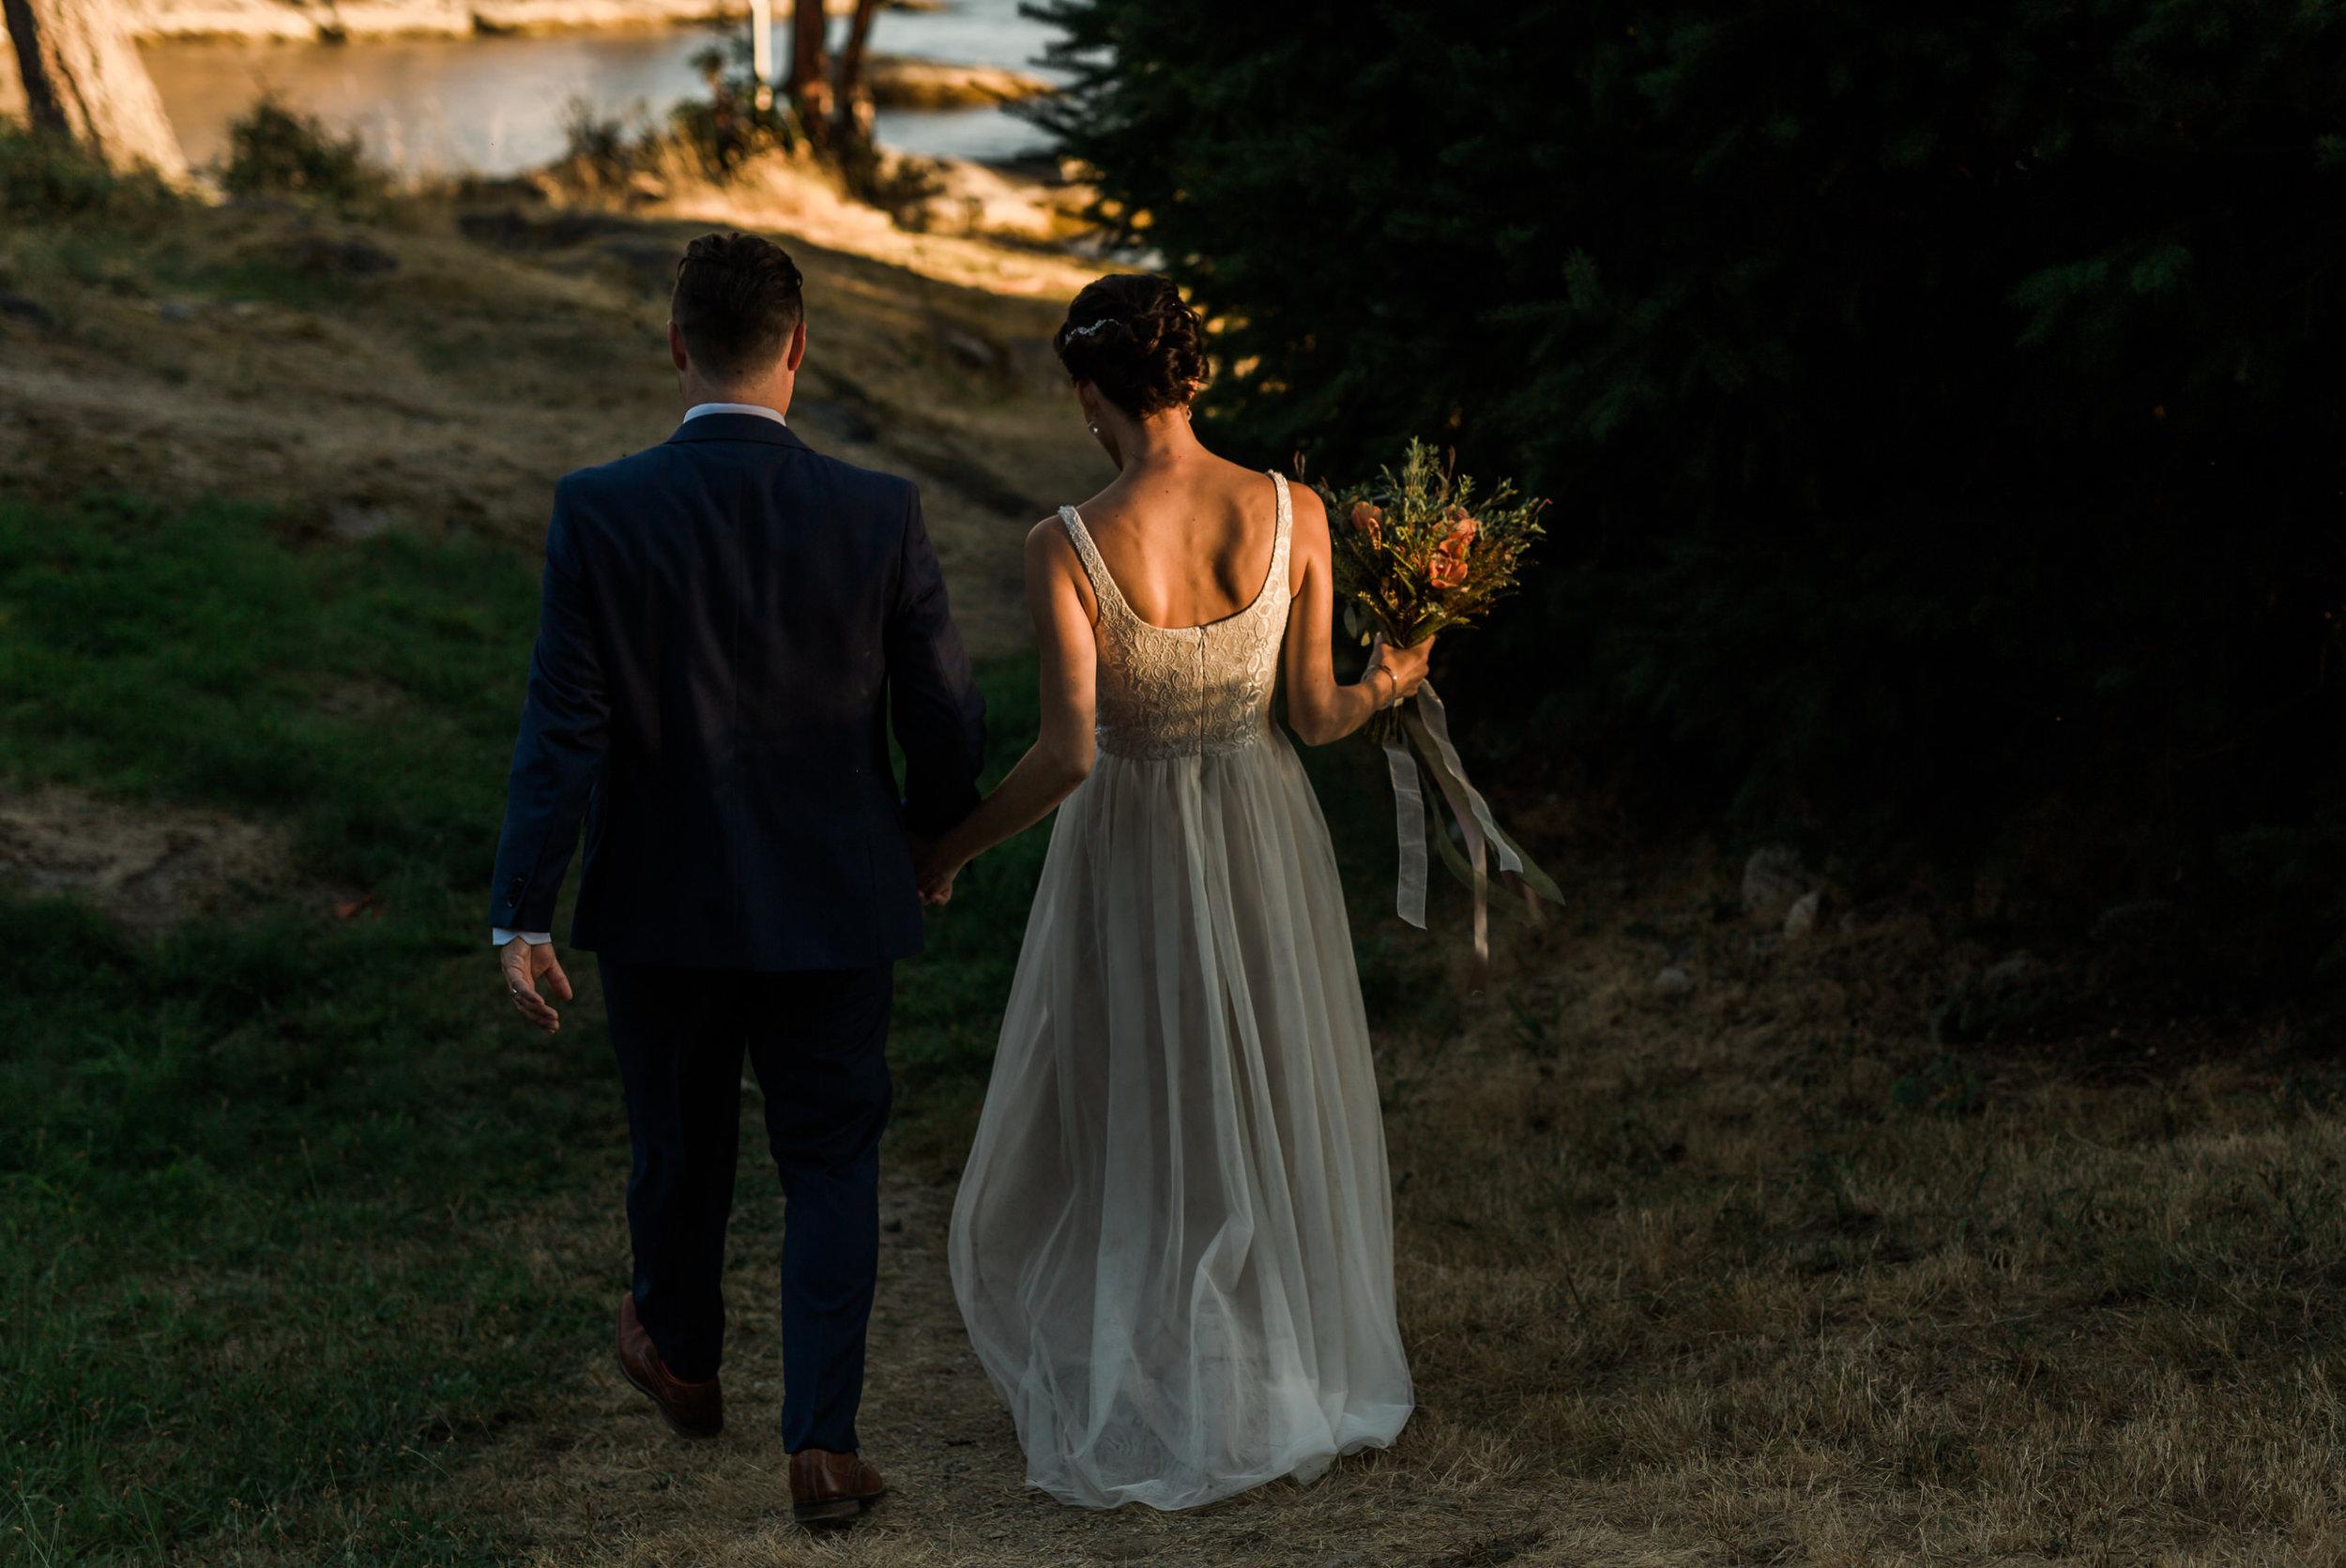 Rockwater Secret Cove Resort Wedding - Sunshine Coast BC Wedding Photographer - Vancouver Wedding Photographer - Sunshine Coast Elopement Photos - IMG_1490.jpg